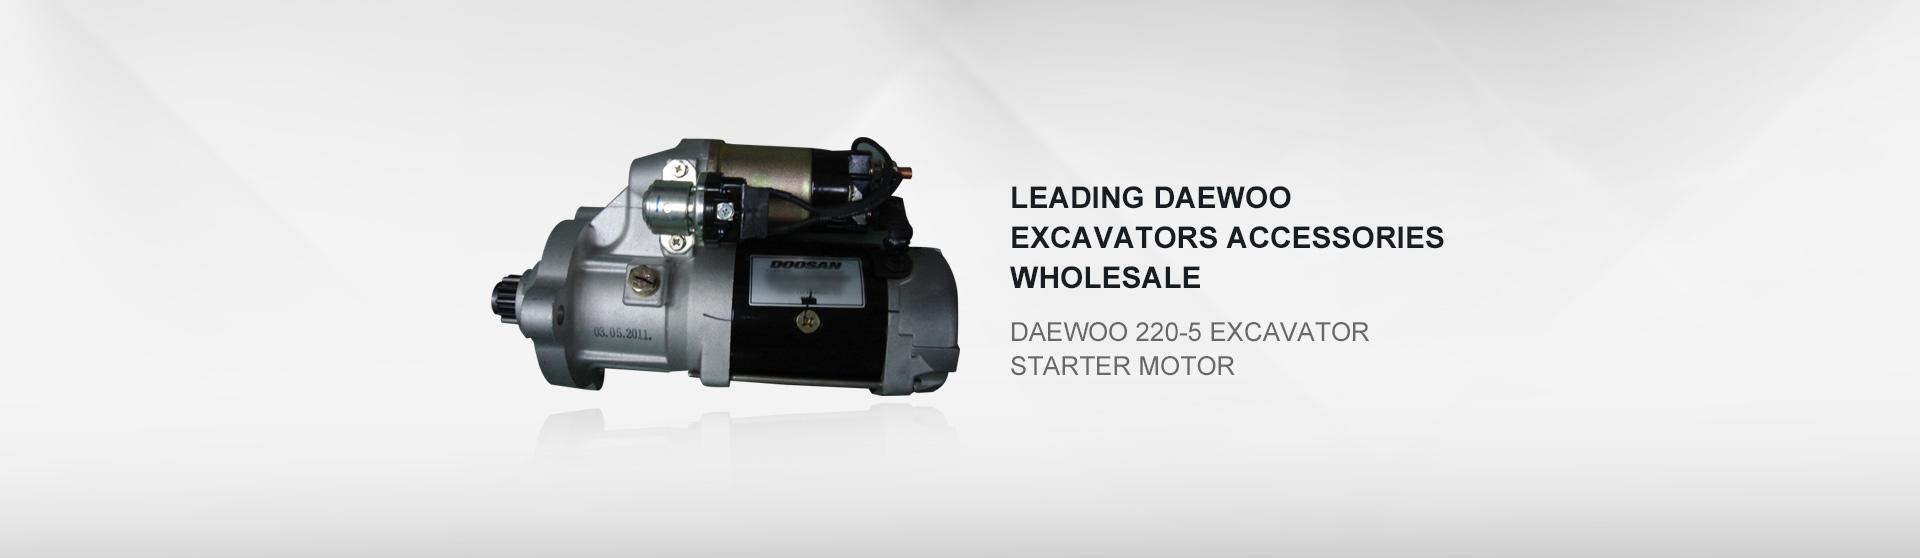 Daewoo 220-5 excavator starter motor